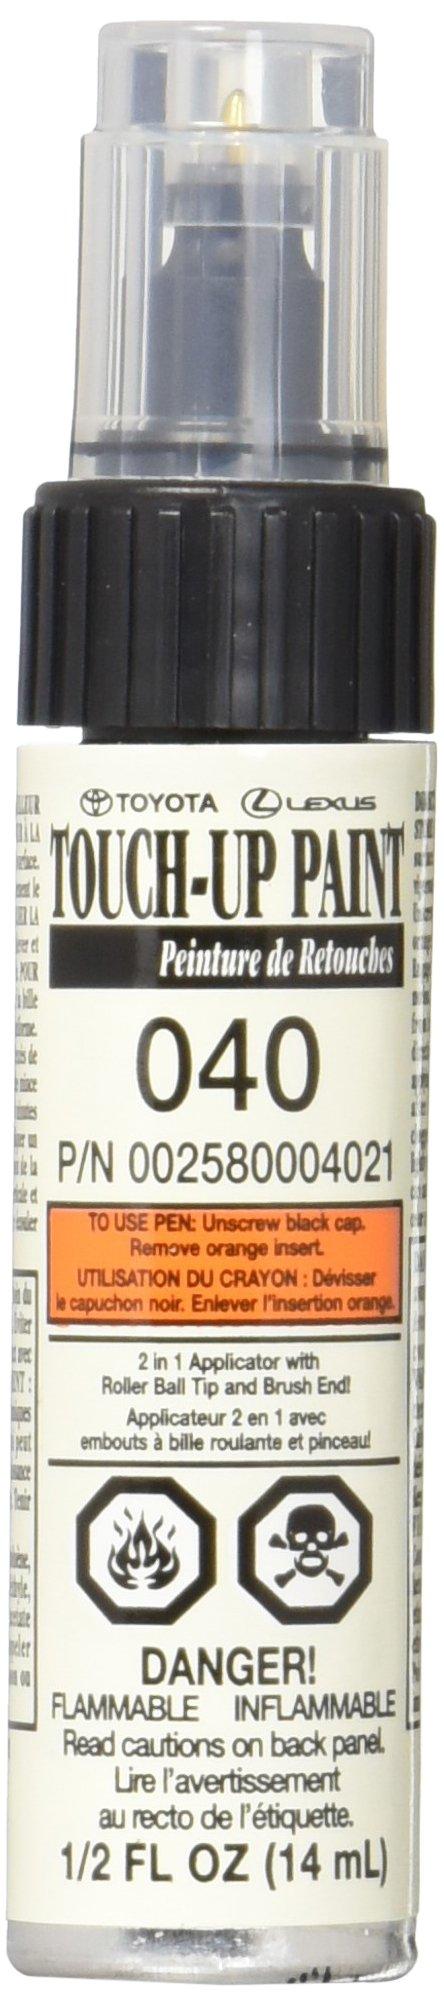 Toyota Genuine 00258-00040-21 White Touch-Up Paint Pen (1/2 fl oz, 14 ml)